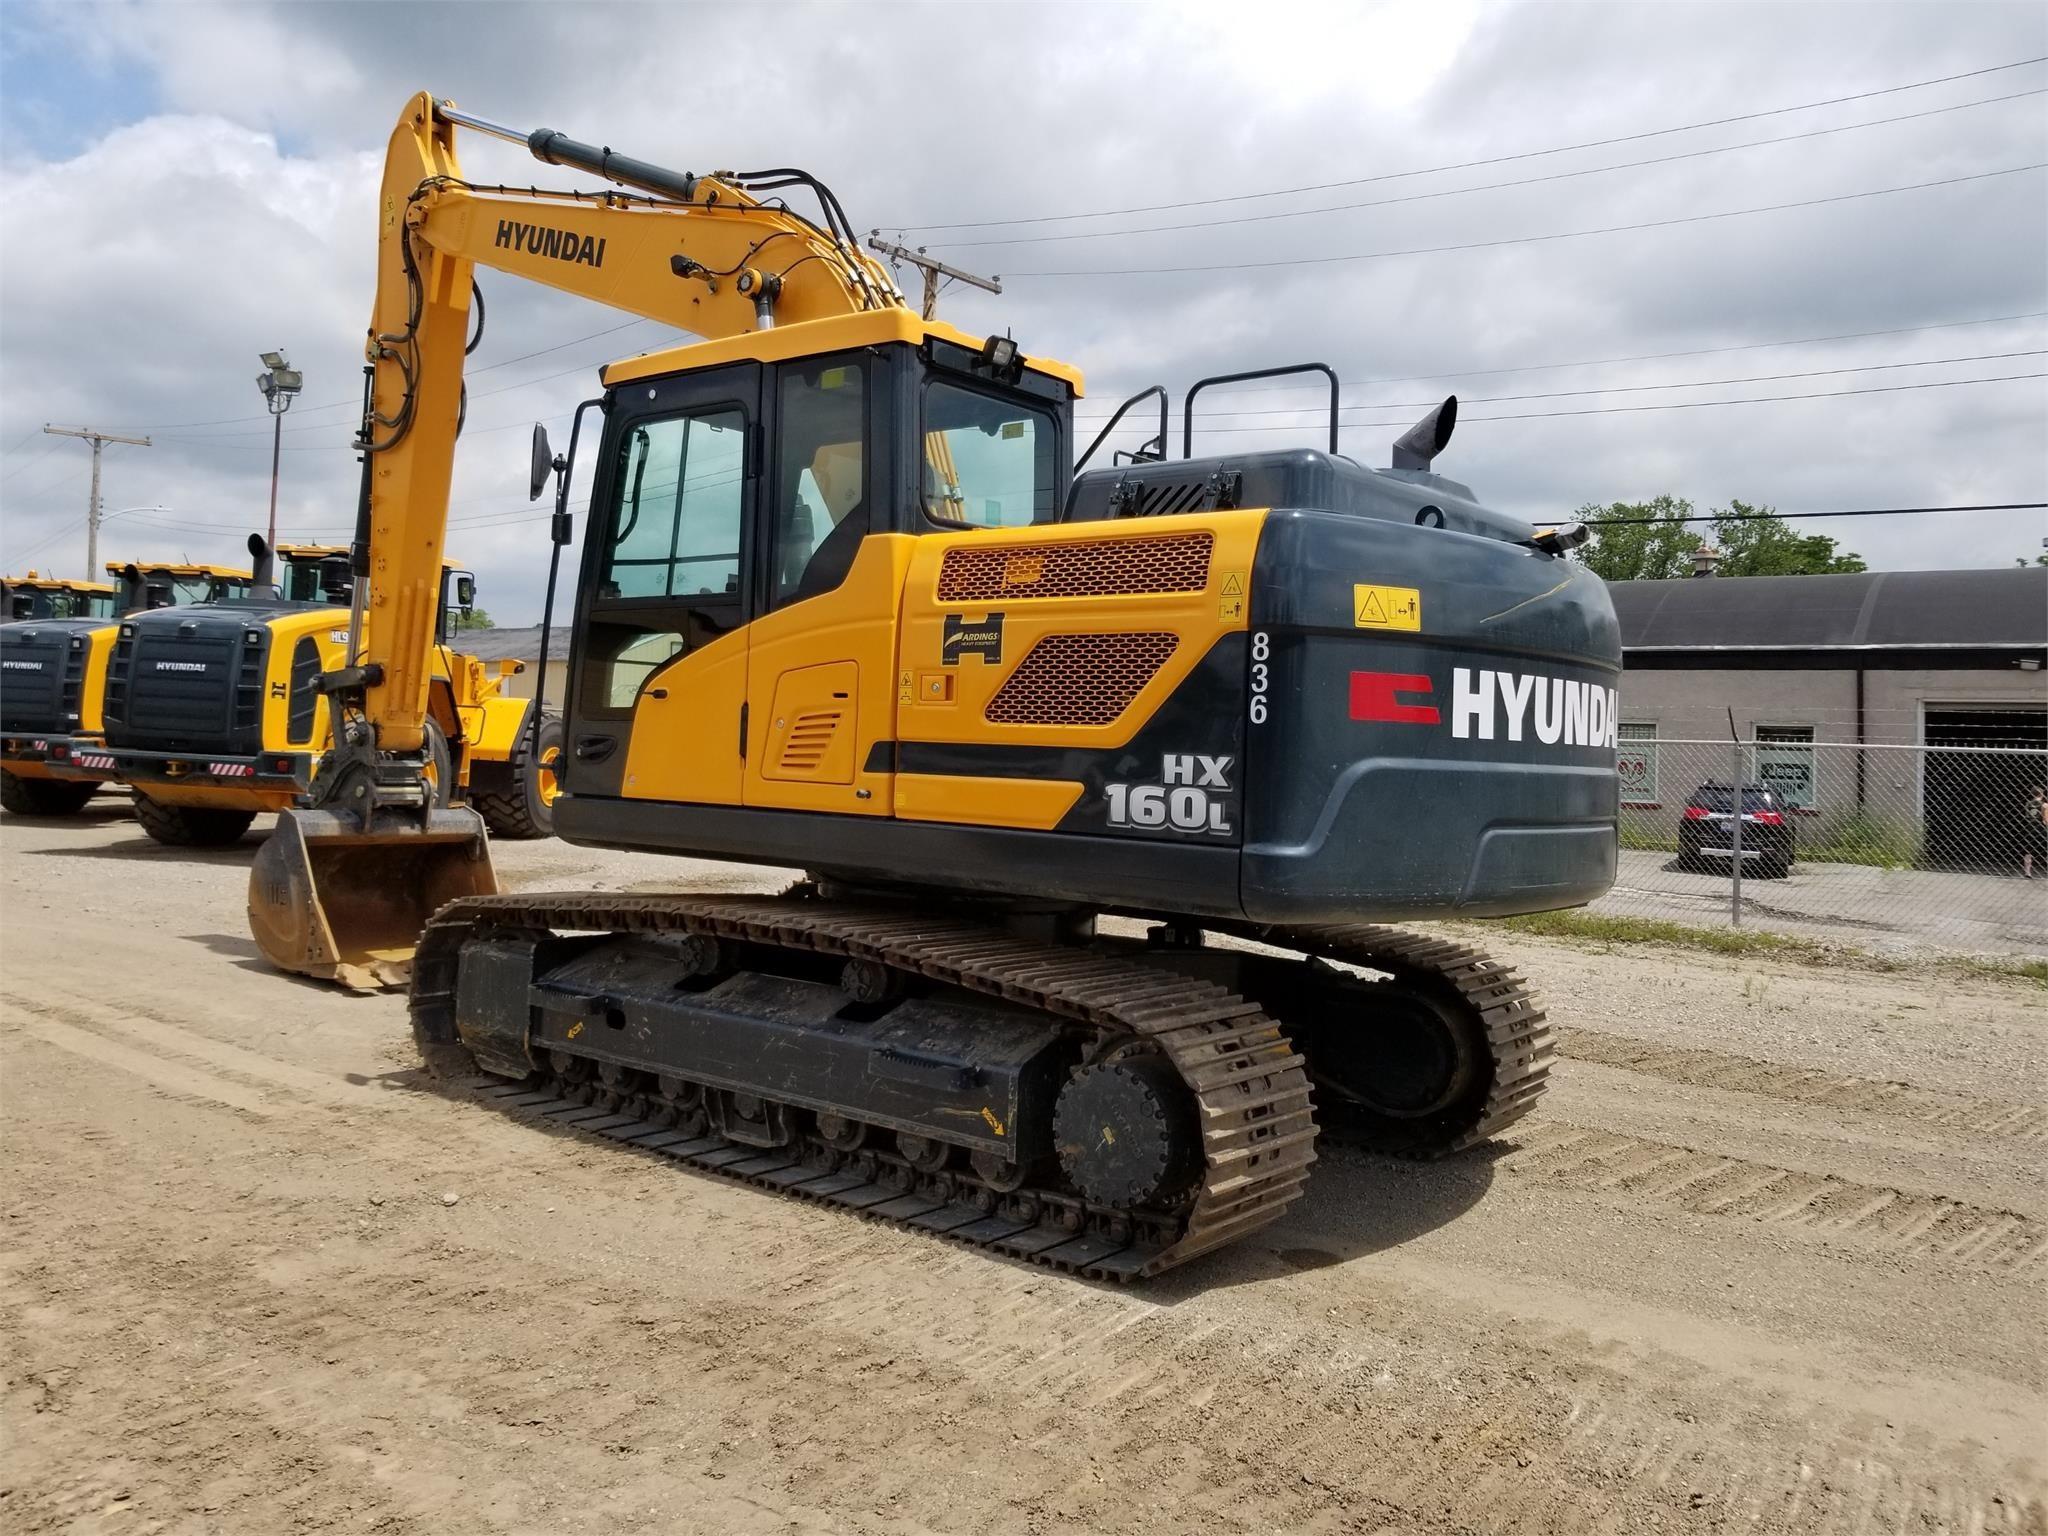 New, 2018, HYUNDAI, HX160L, Excavators - Crawler